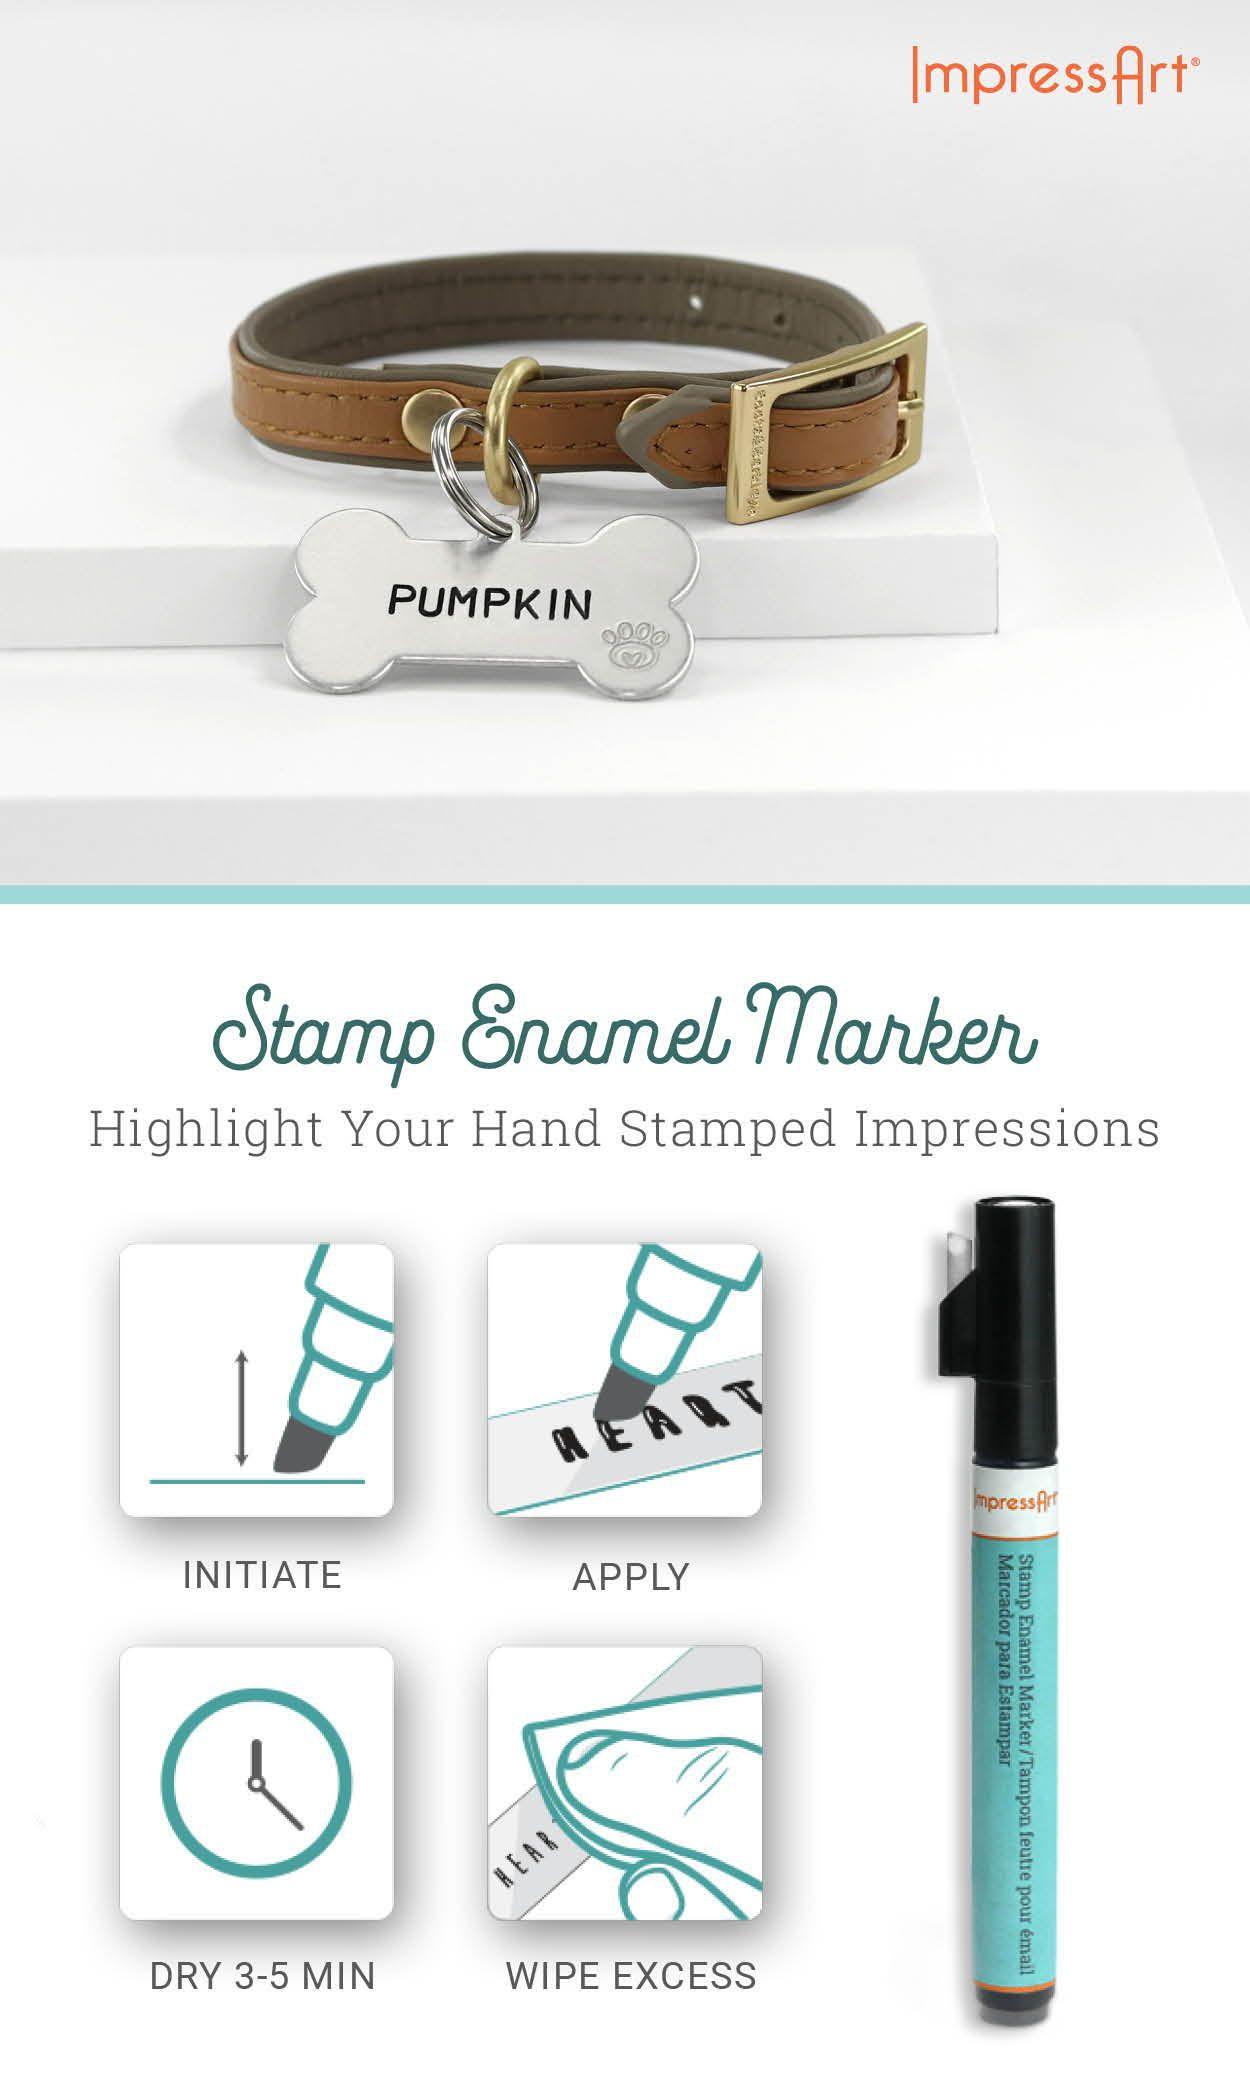 Antique Stamp Enamel Marker 4 Pack Diy Jewelry Stamping